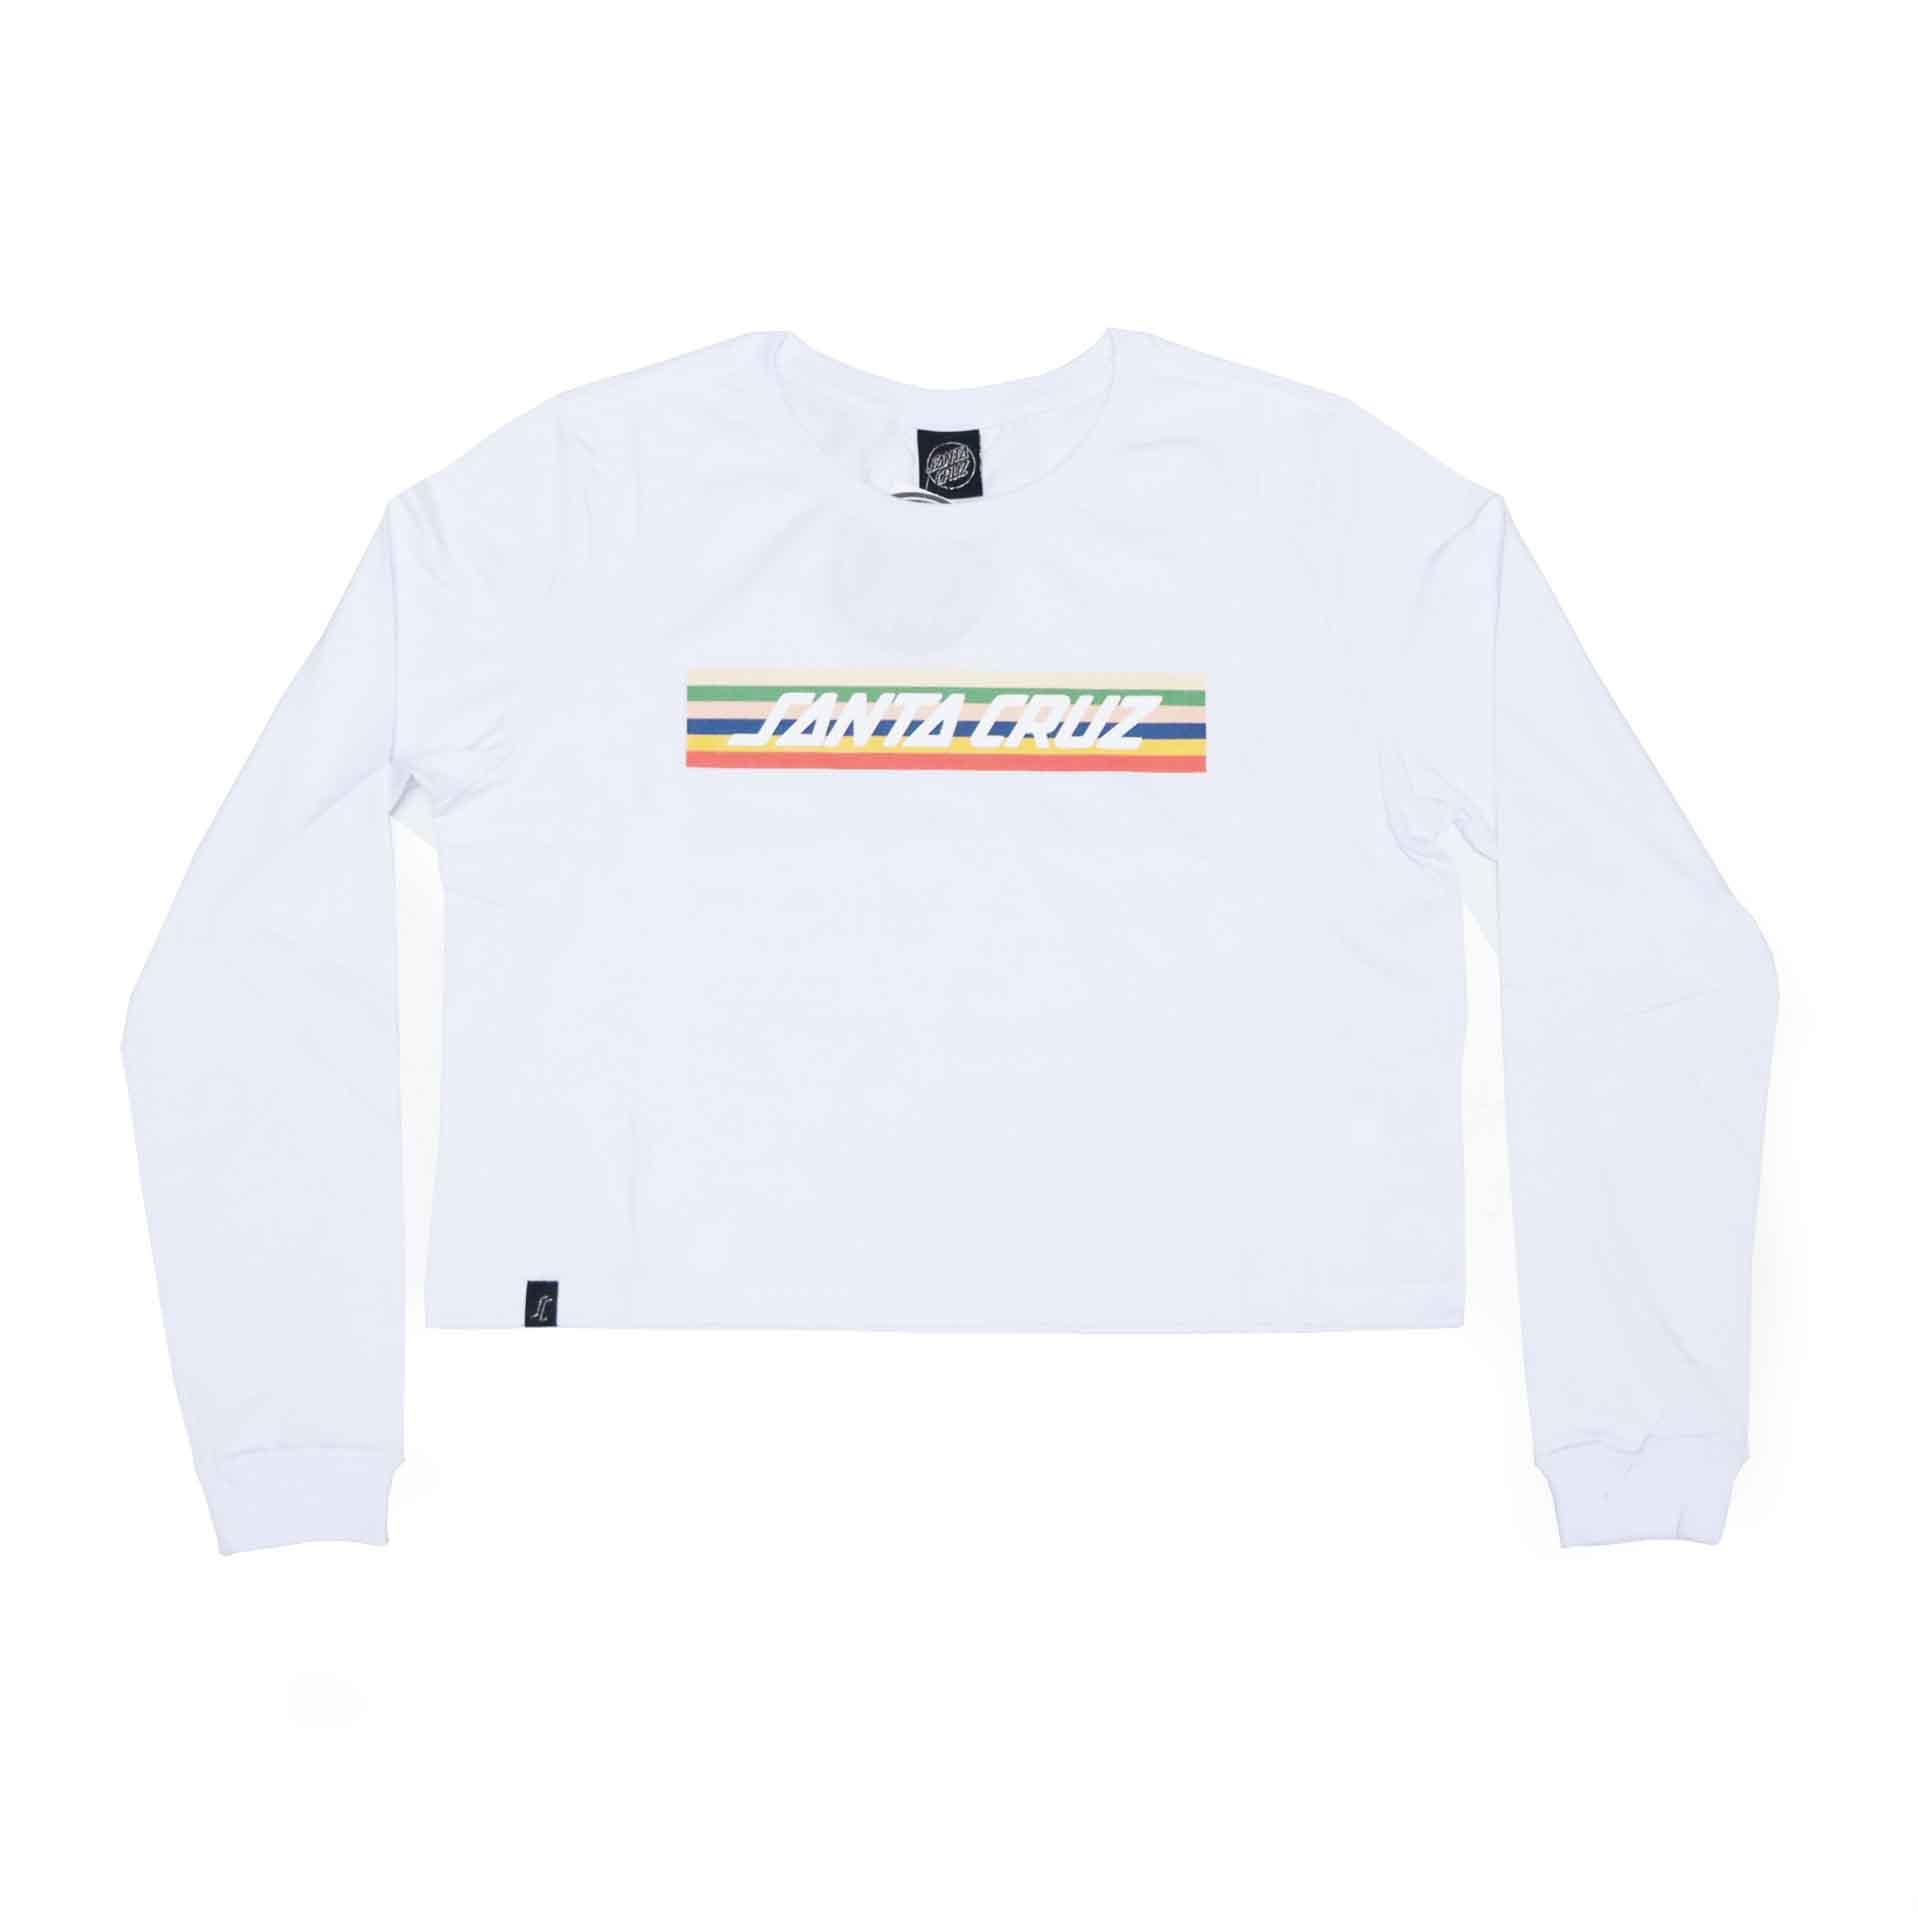 Camiseta Manga Longa Cropp Feminina Santa Cruz Stripe - Branco